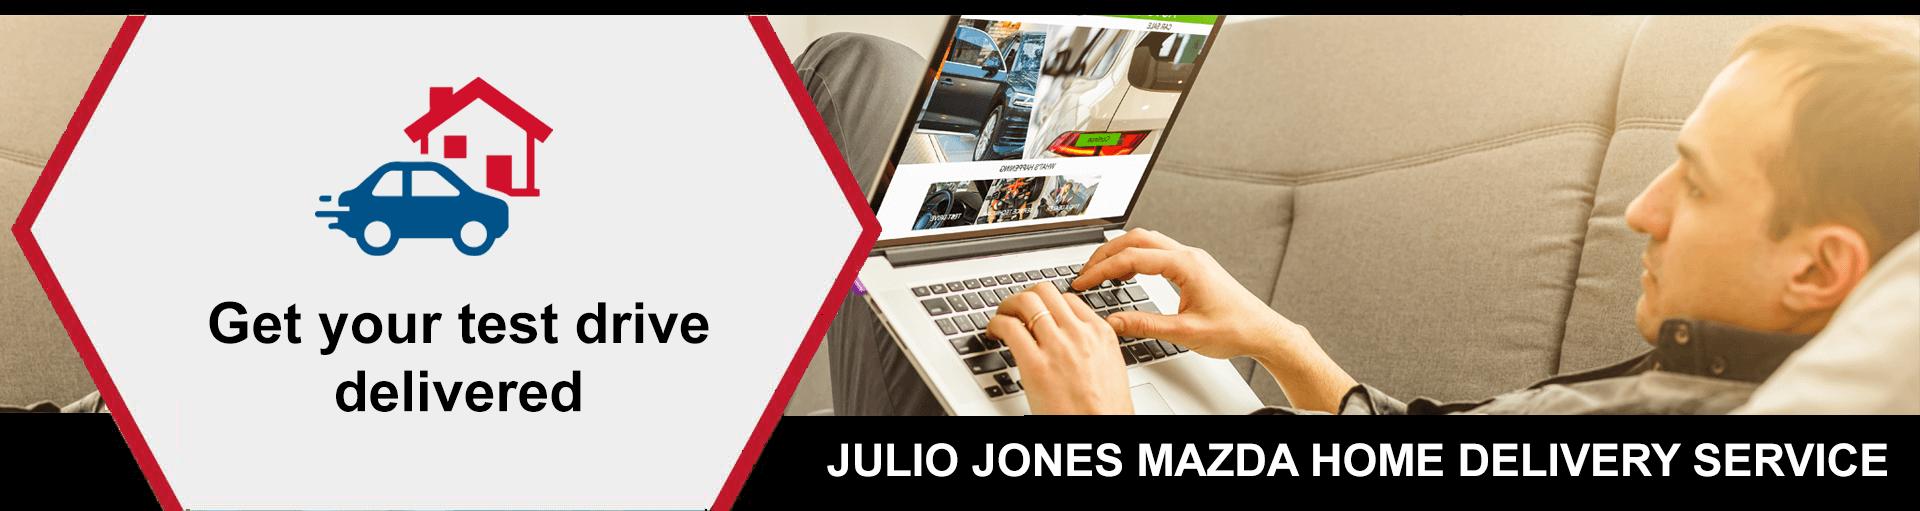 Julio Jones Mazda Home Delivery